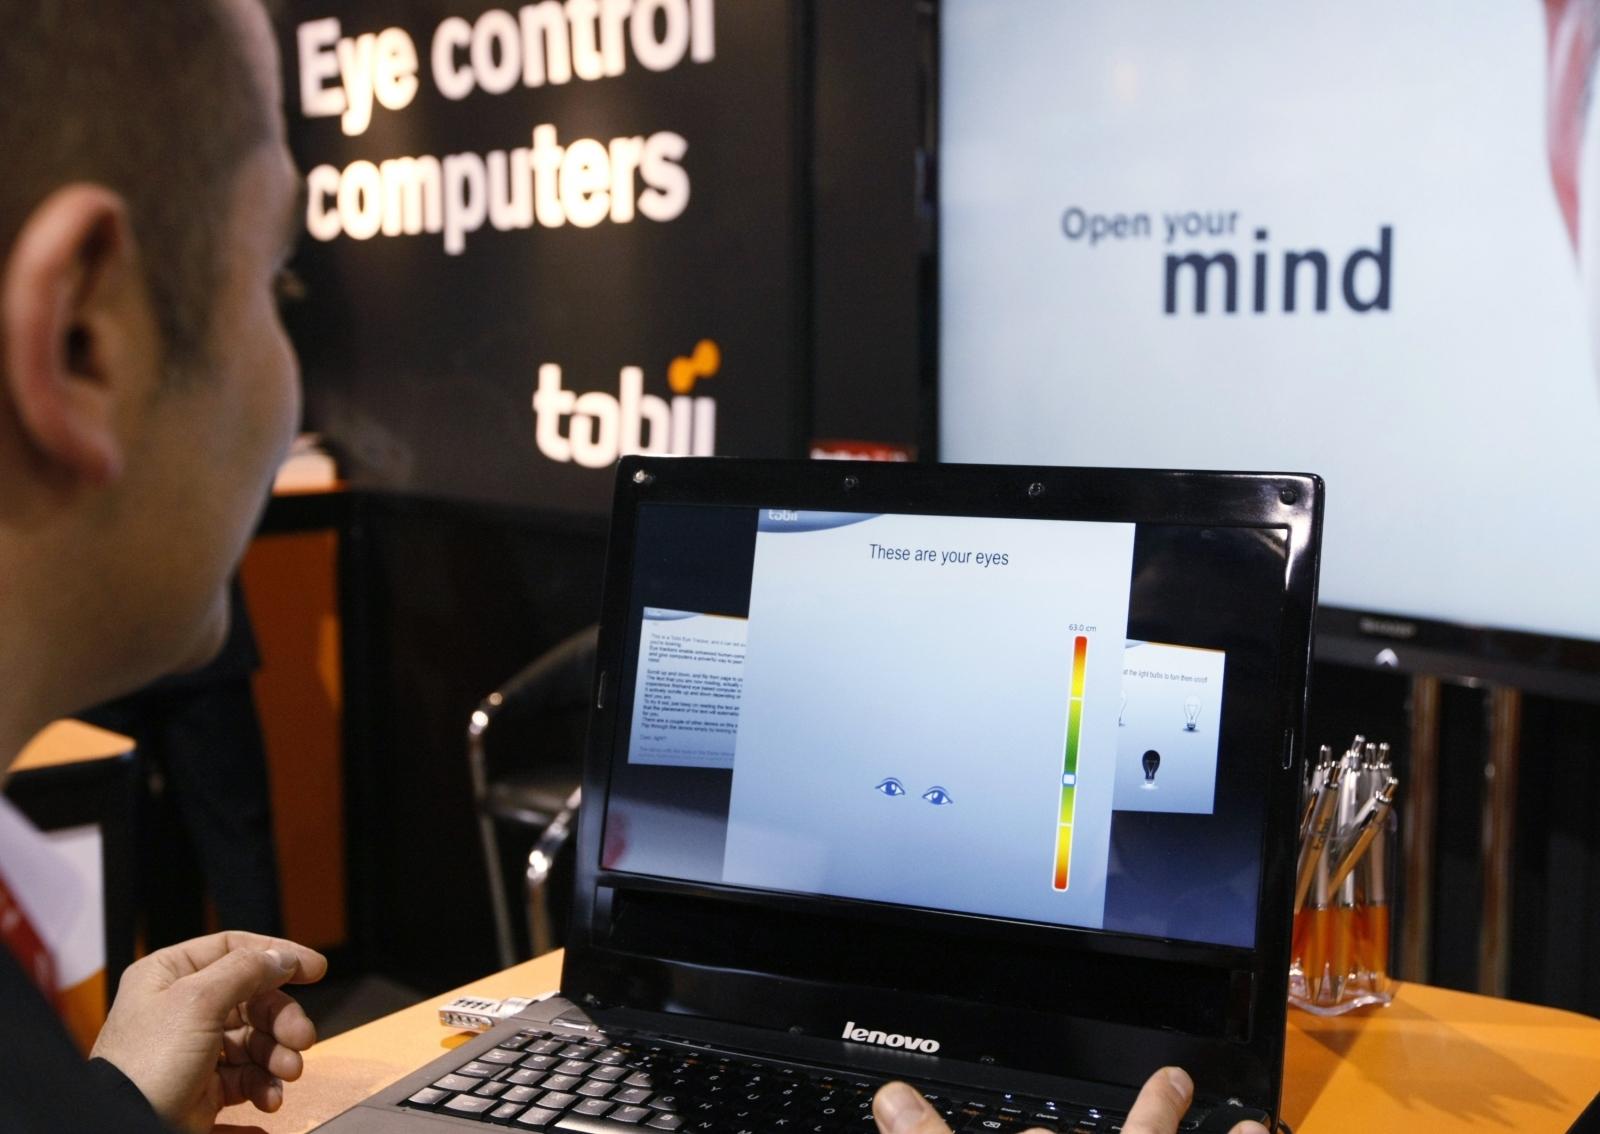 Windows 10 will get eye-tracking